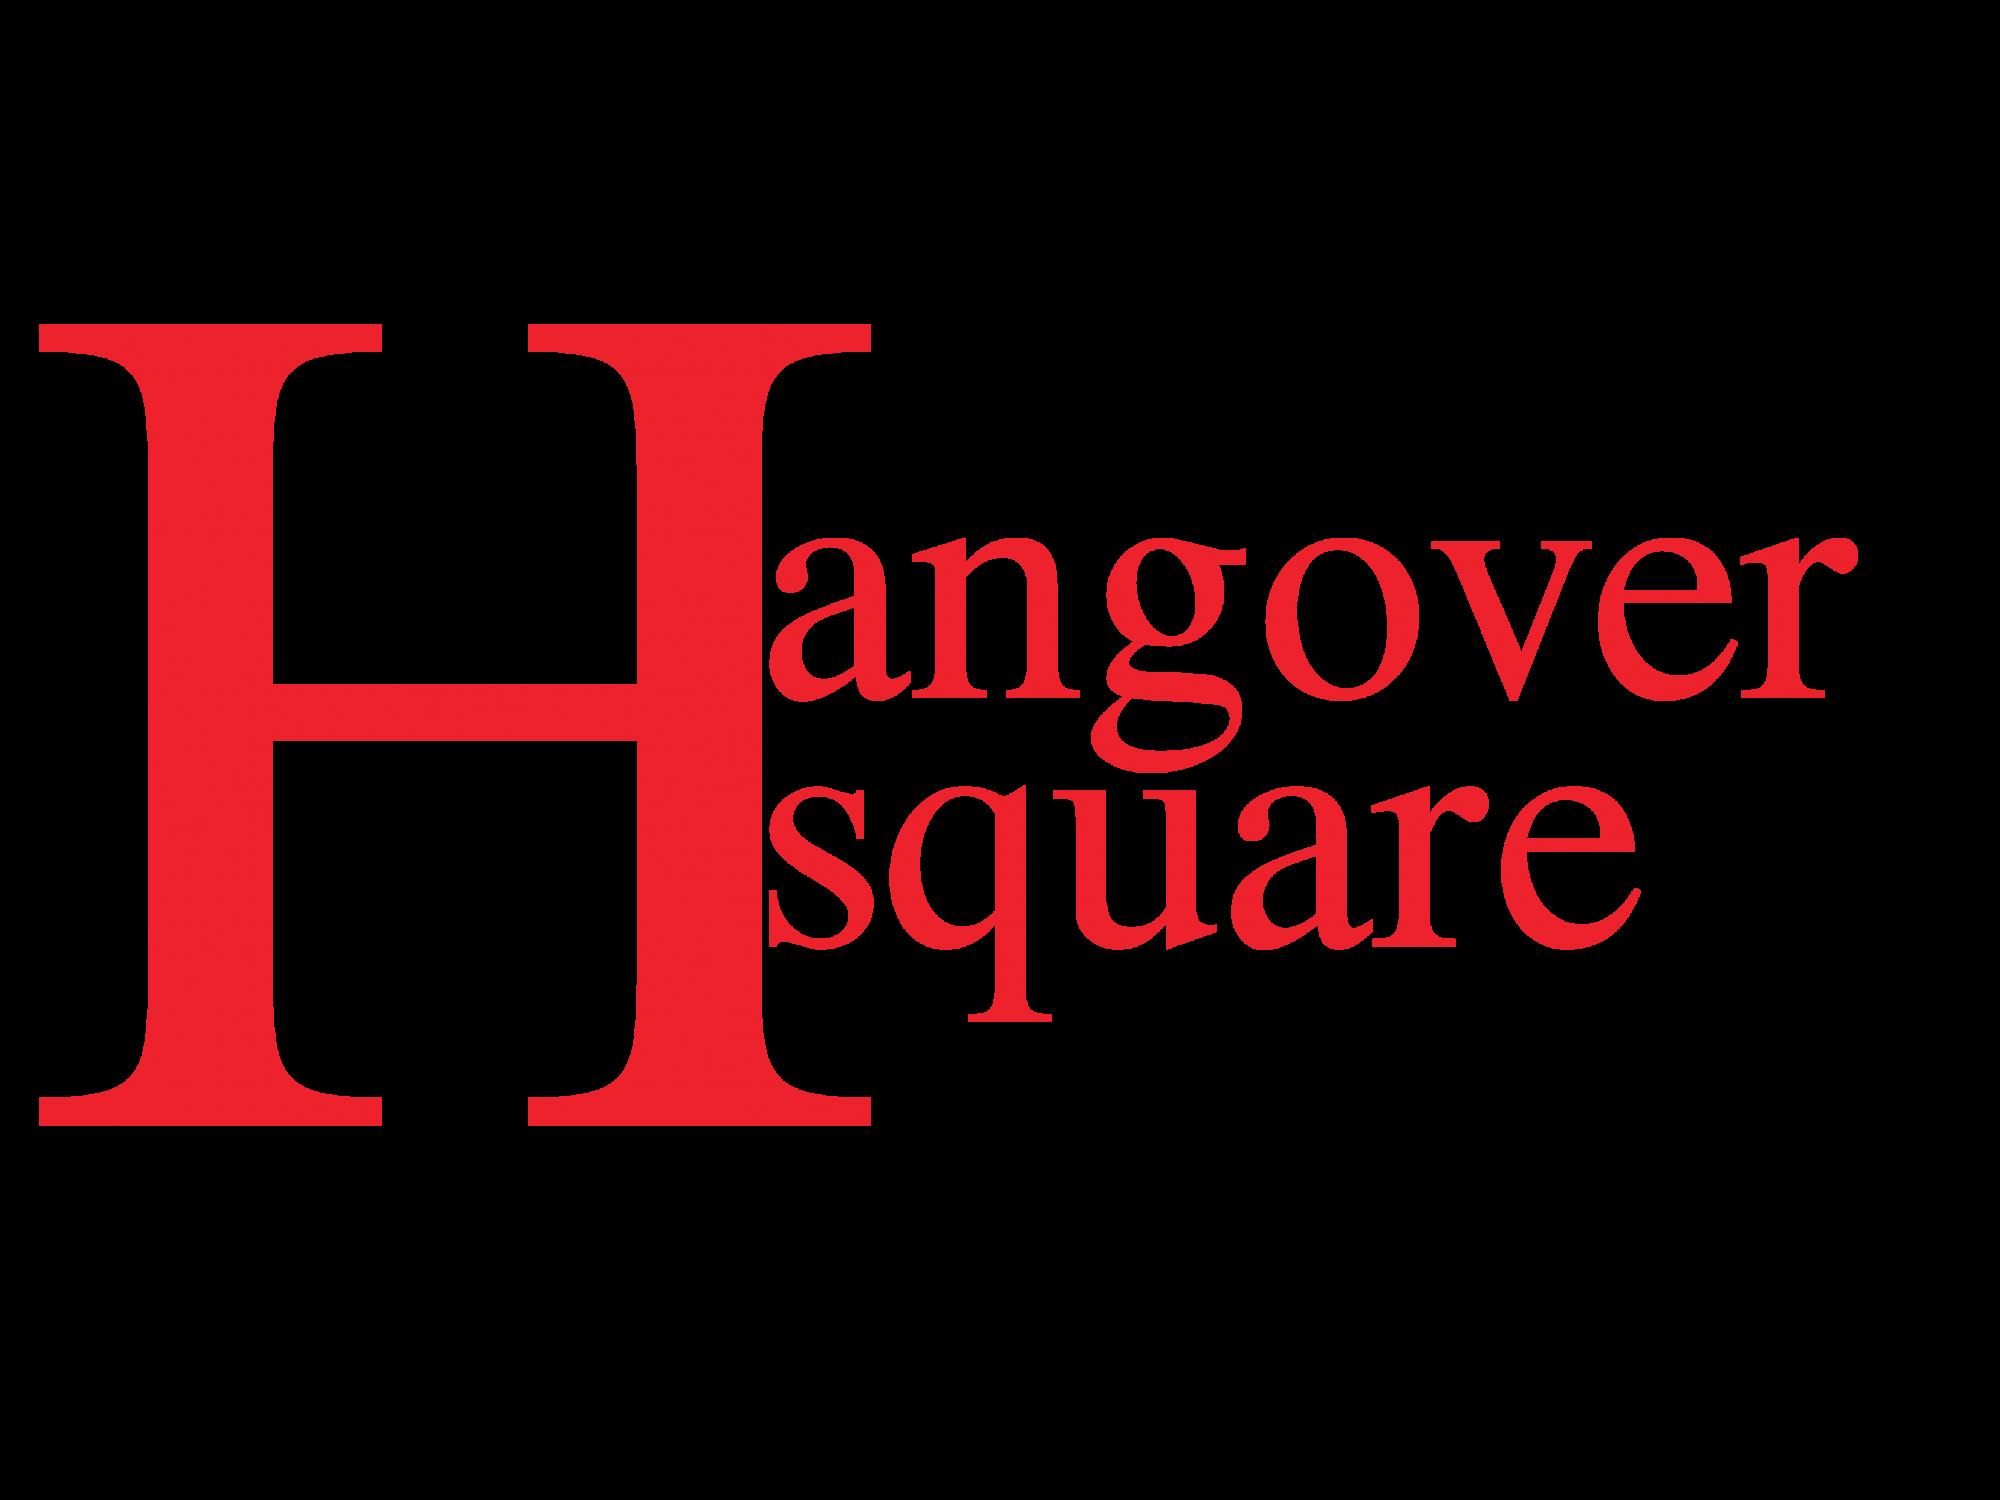 H.sq. logo 1